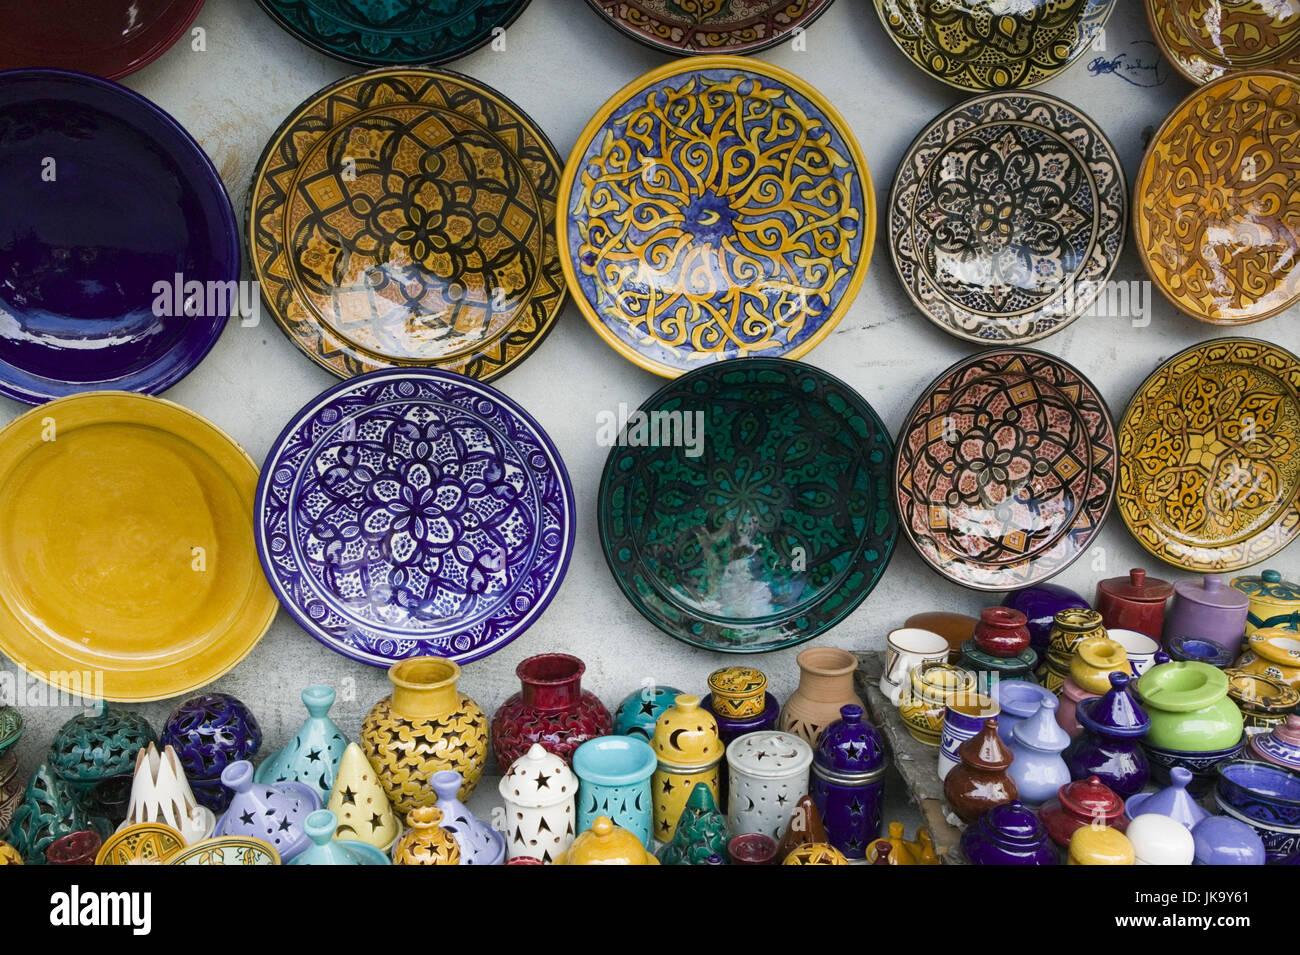 Marokko, Casablanca, Quartier Habous,  Souvenirgeschäft, Keramik, Detail,   Stadt, Stadtteil, Geschäft, - Stock Image